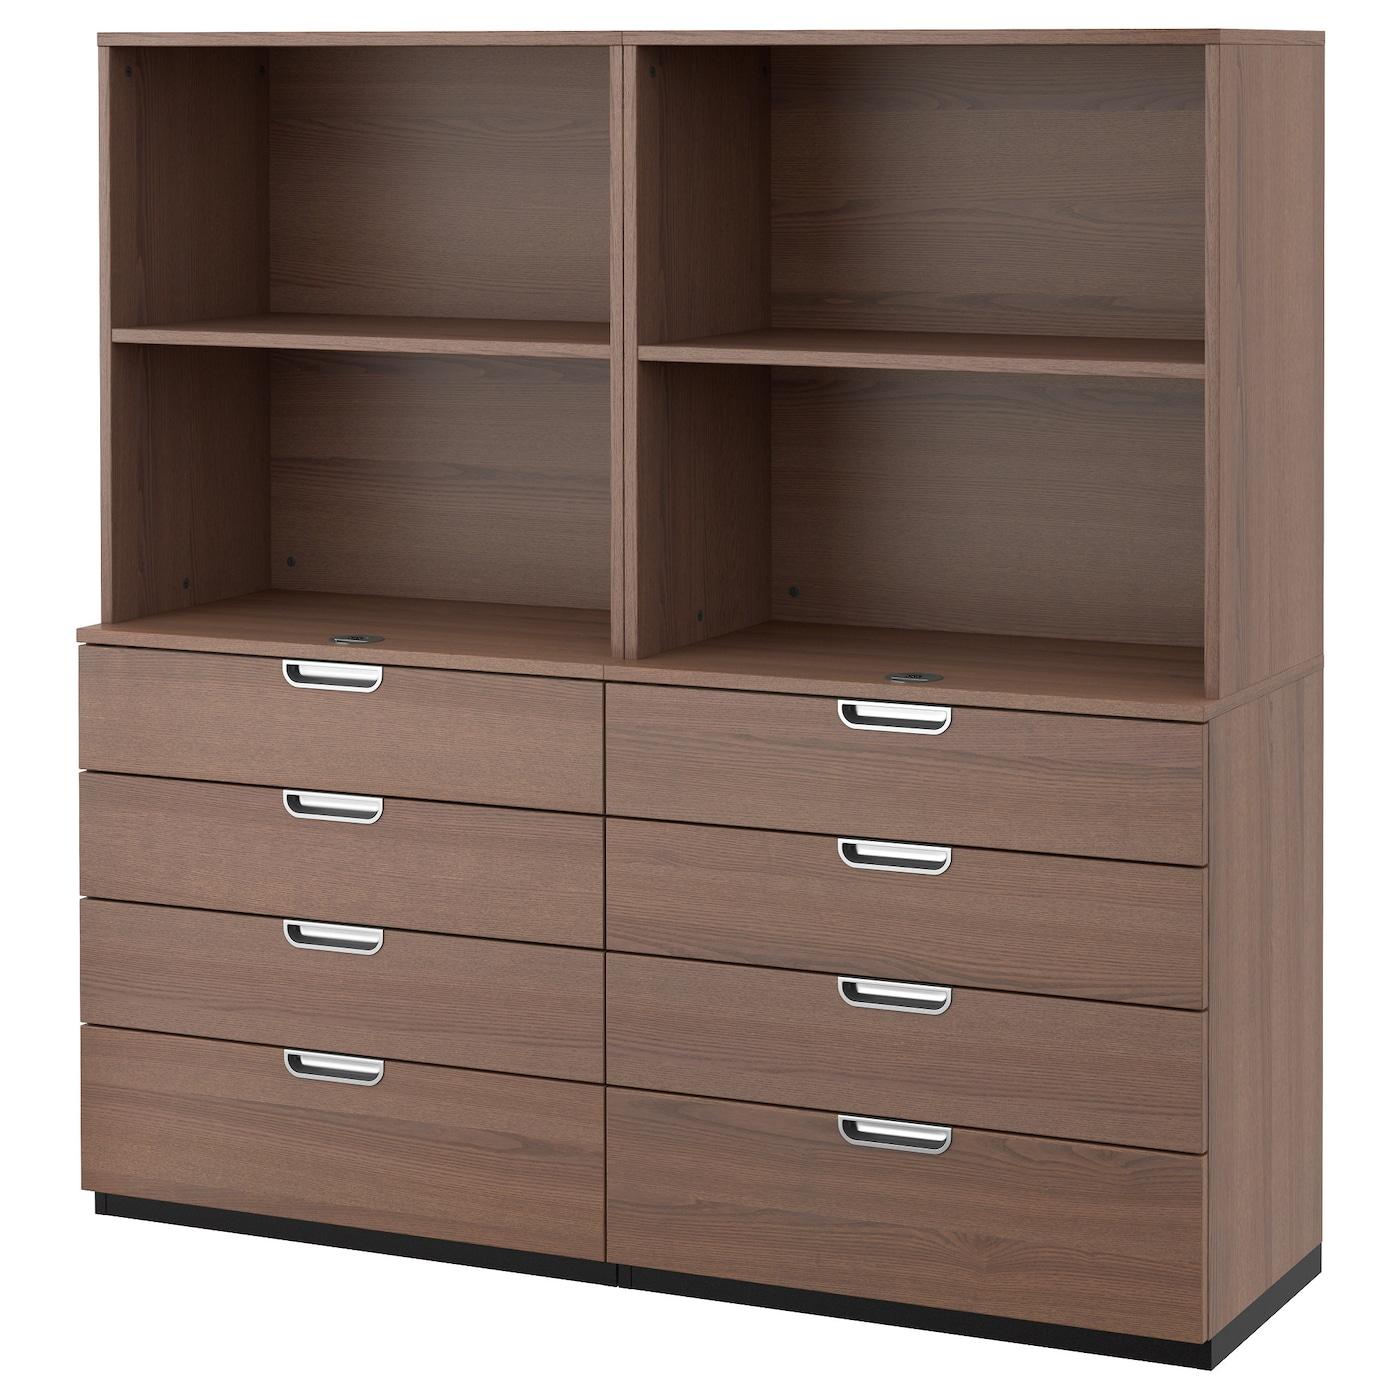 Galant combinaison rangement tiroirs gris 160 x 160 cm ikea for Bureau ikea avec tiroir classeur